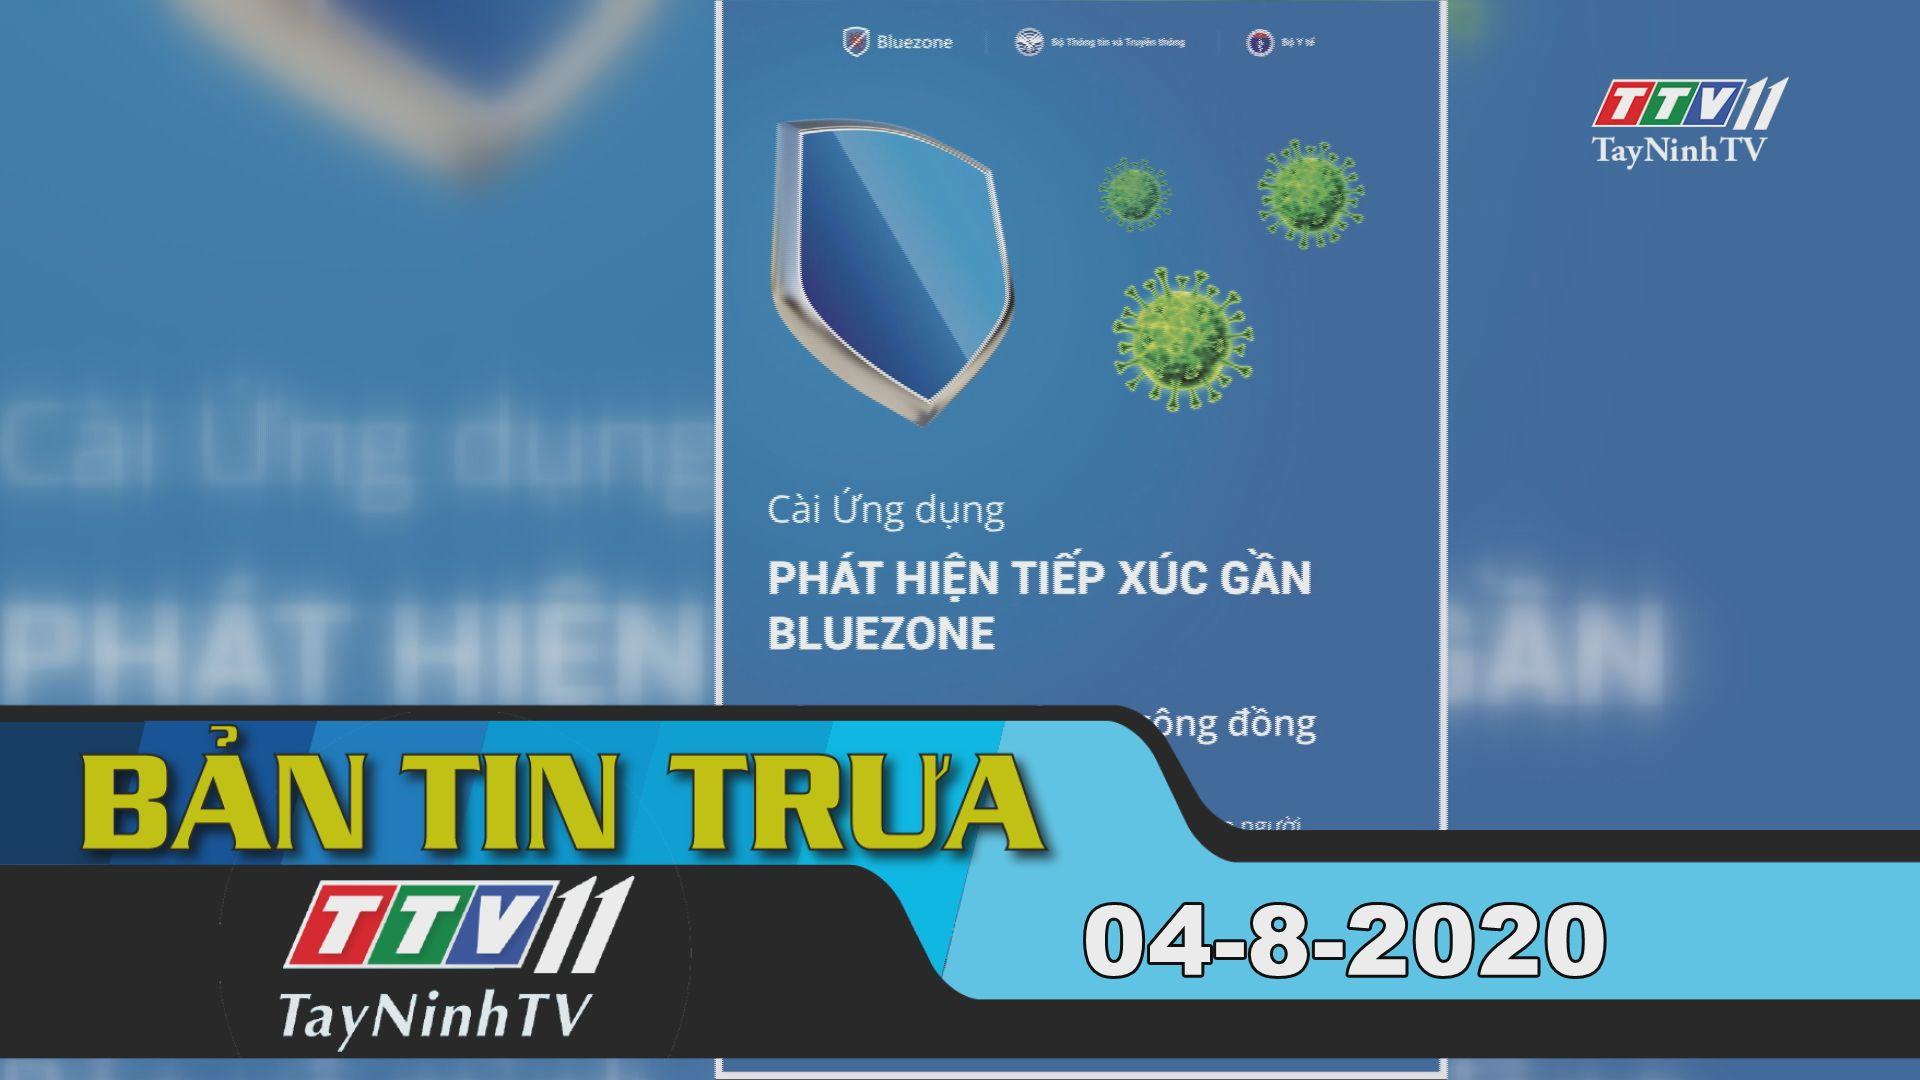 Bản tin trưa 04-8-2020 | Tin tức hôm nay | TayNinhTV